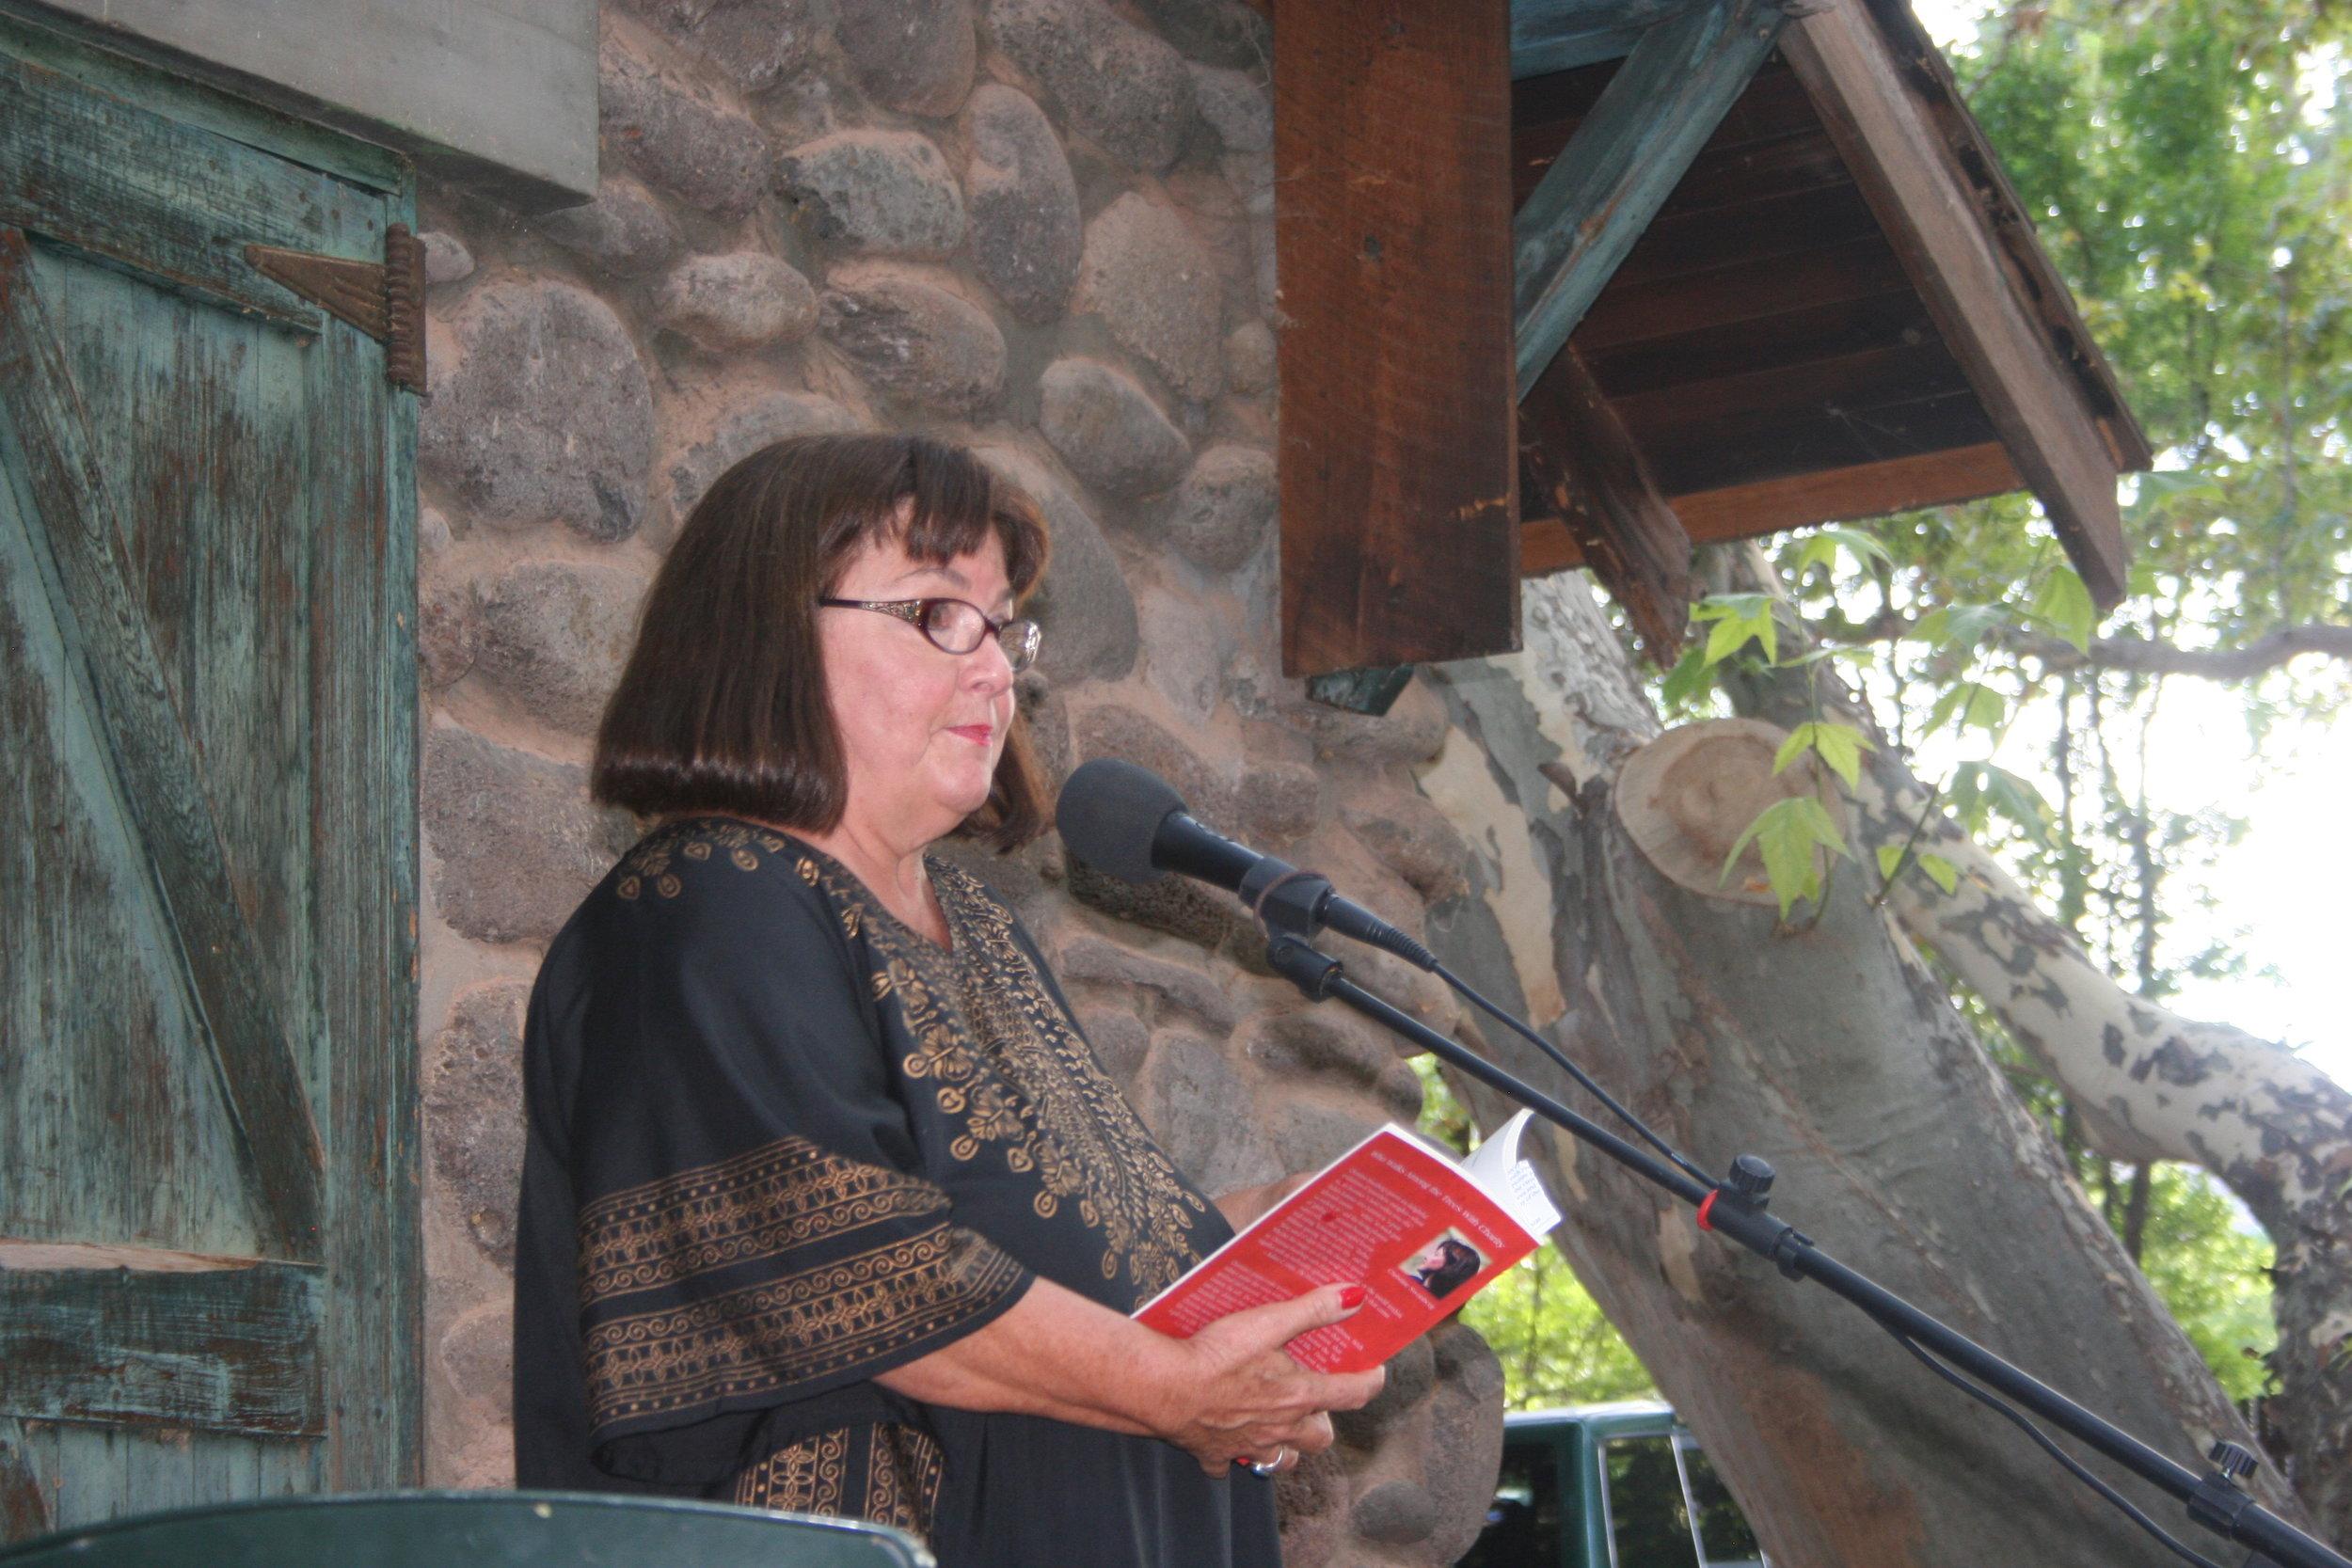 OCTOBER: Christine Swanberg